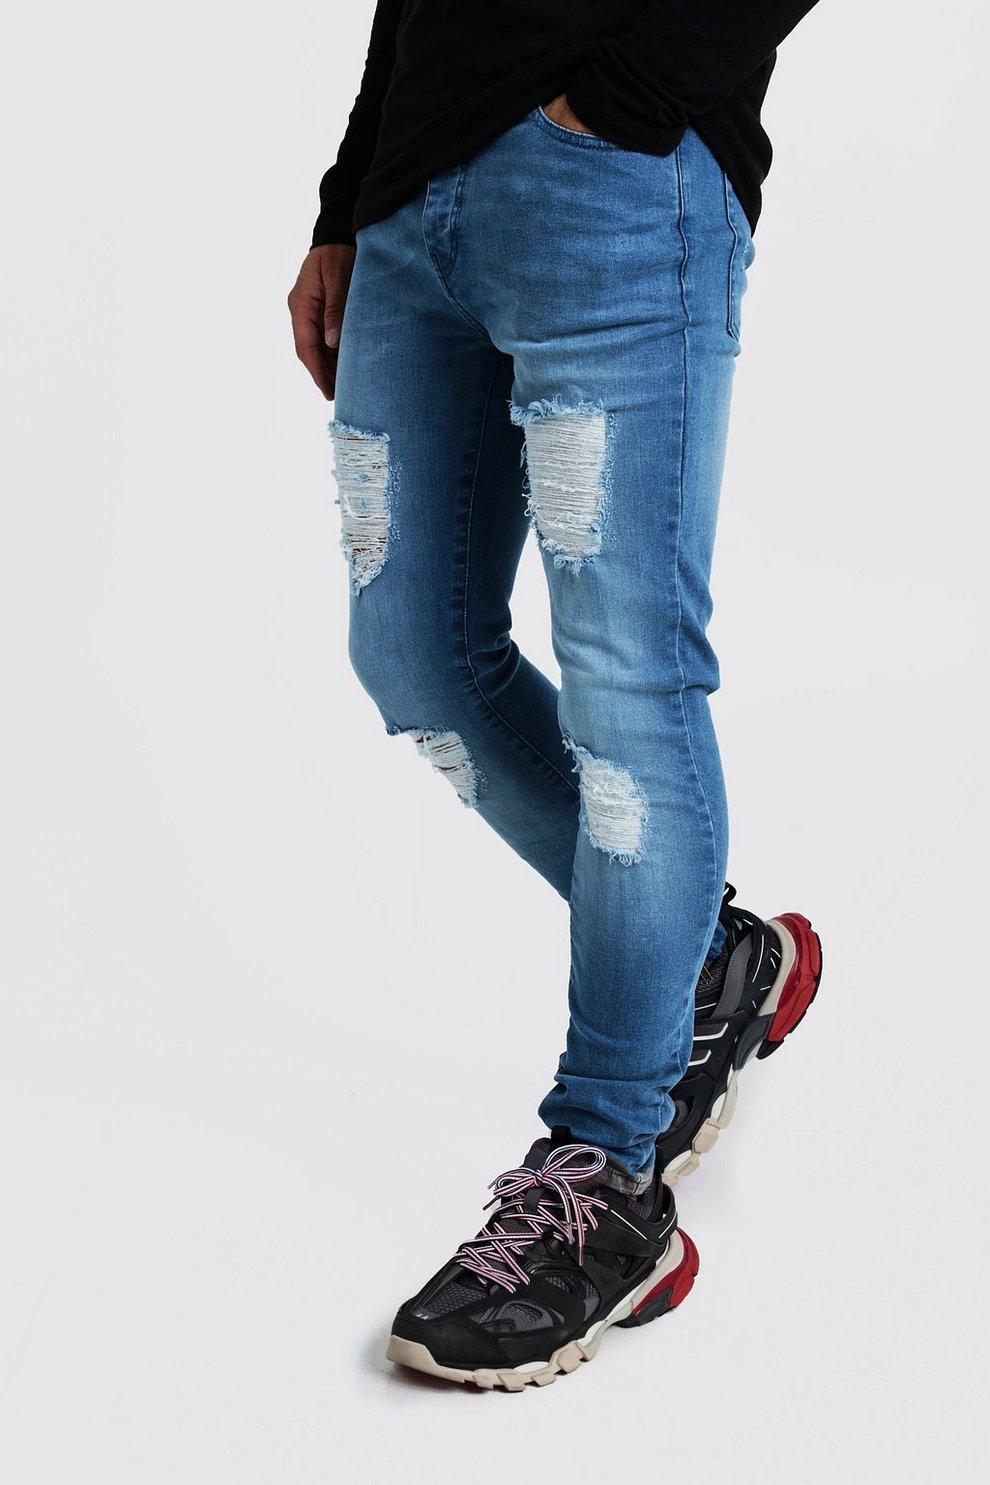 4dcd04d58b7c Super Skinny Jeans With Distressed Knees | Boohoo